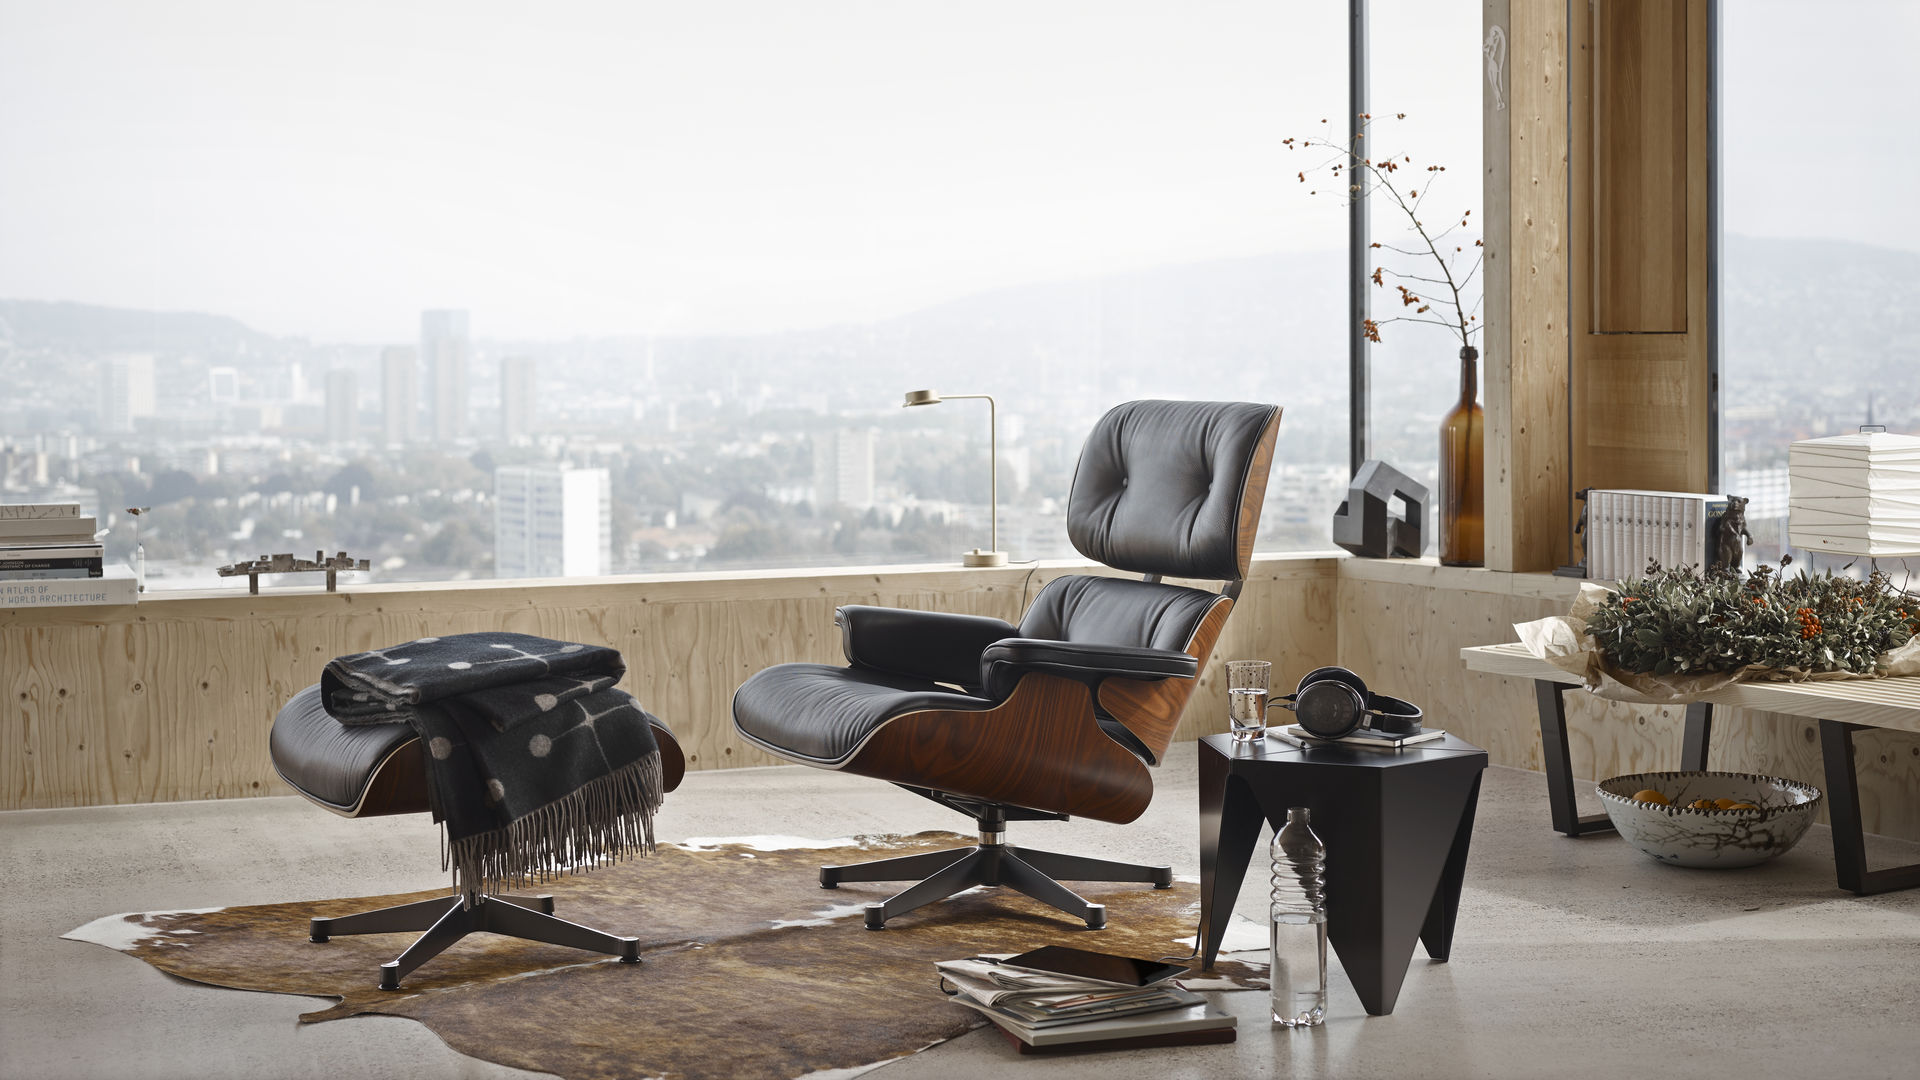 Eames Lounge Chair and Ottoman 2.jpg